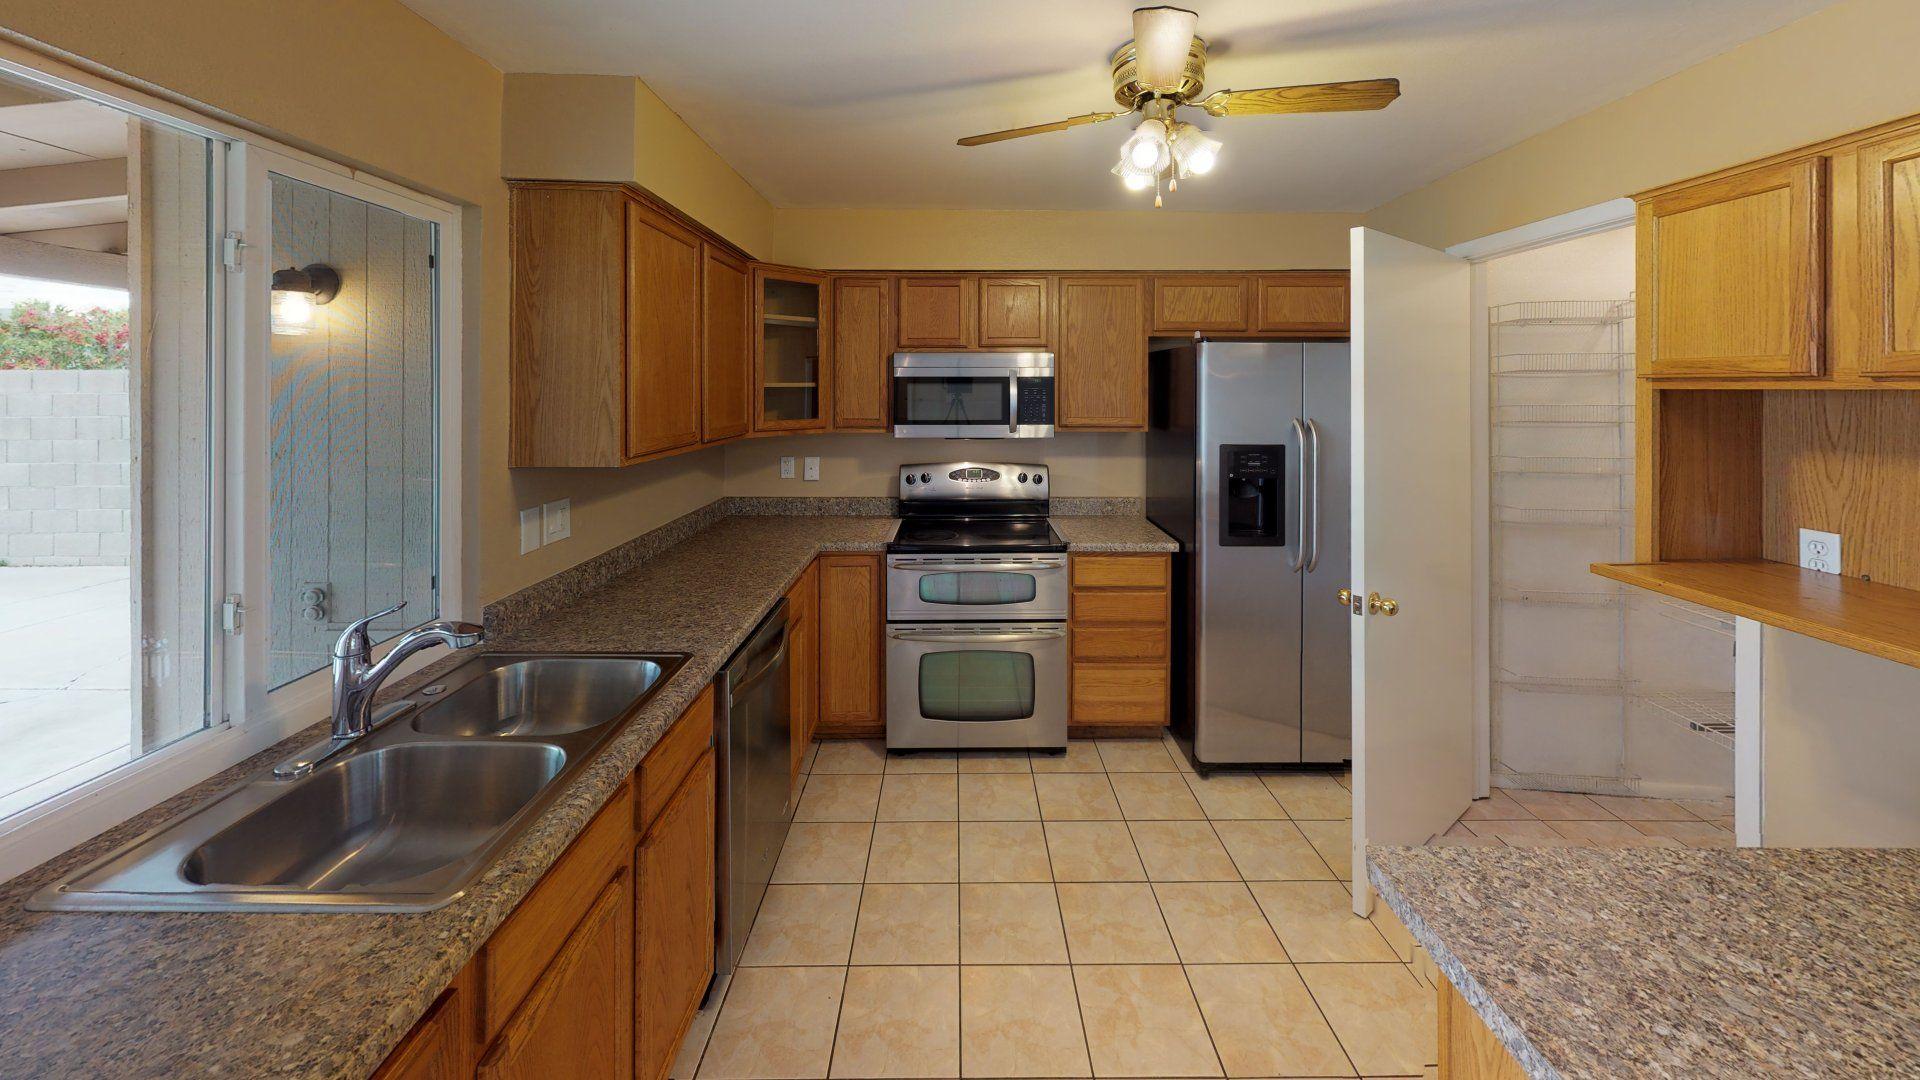 Explore 9628 N 56th Ave Glendale Az 85302 In 3d Glendale Az Glendale Kitchen Cabinets